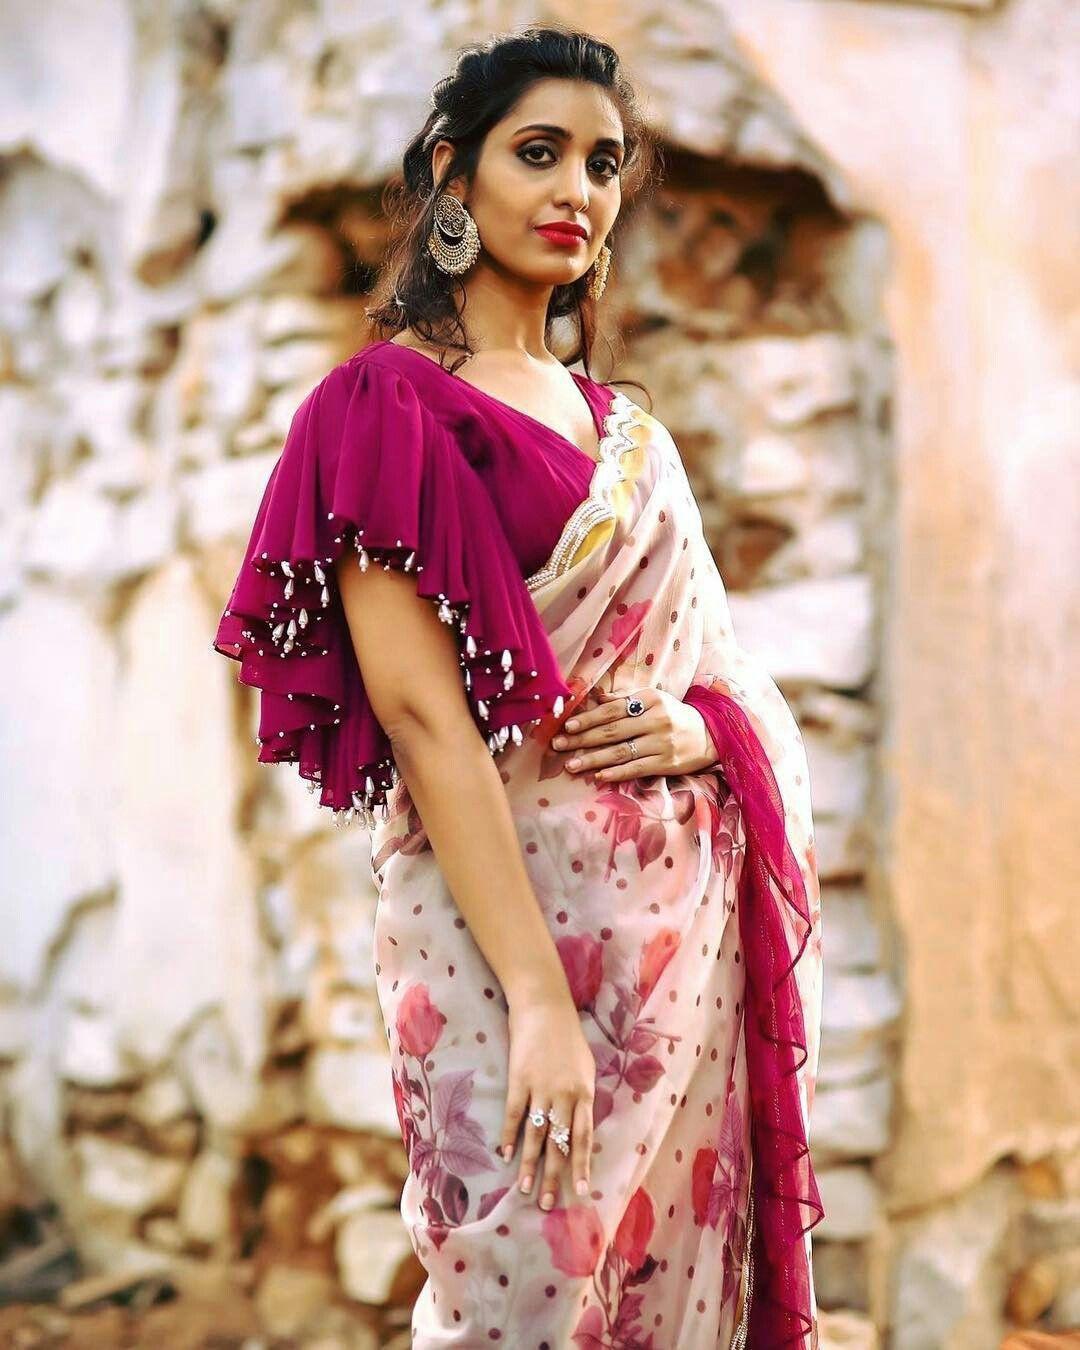 60+ Best #Trending Blouse Sleeve Design | Bridal Wear Ideas images in 2020 | blouse designs, trendy blouse designs, bridal wear